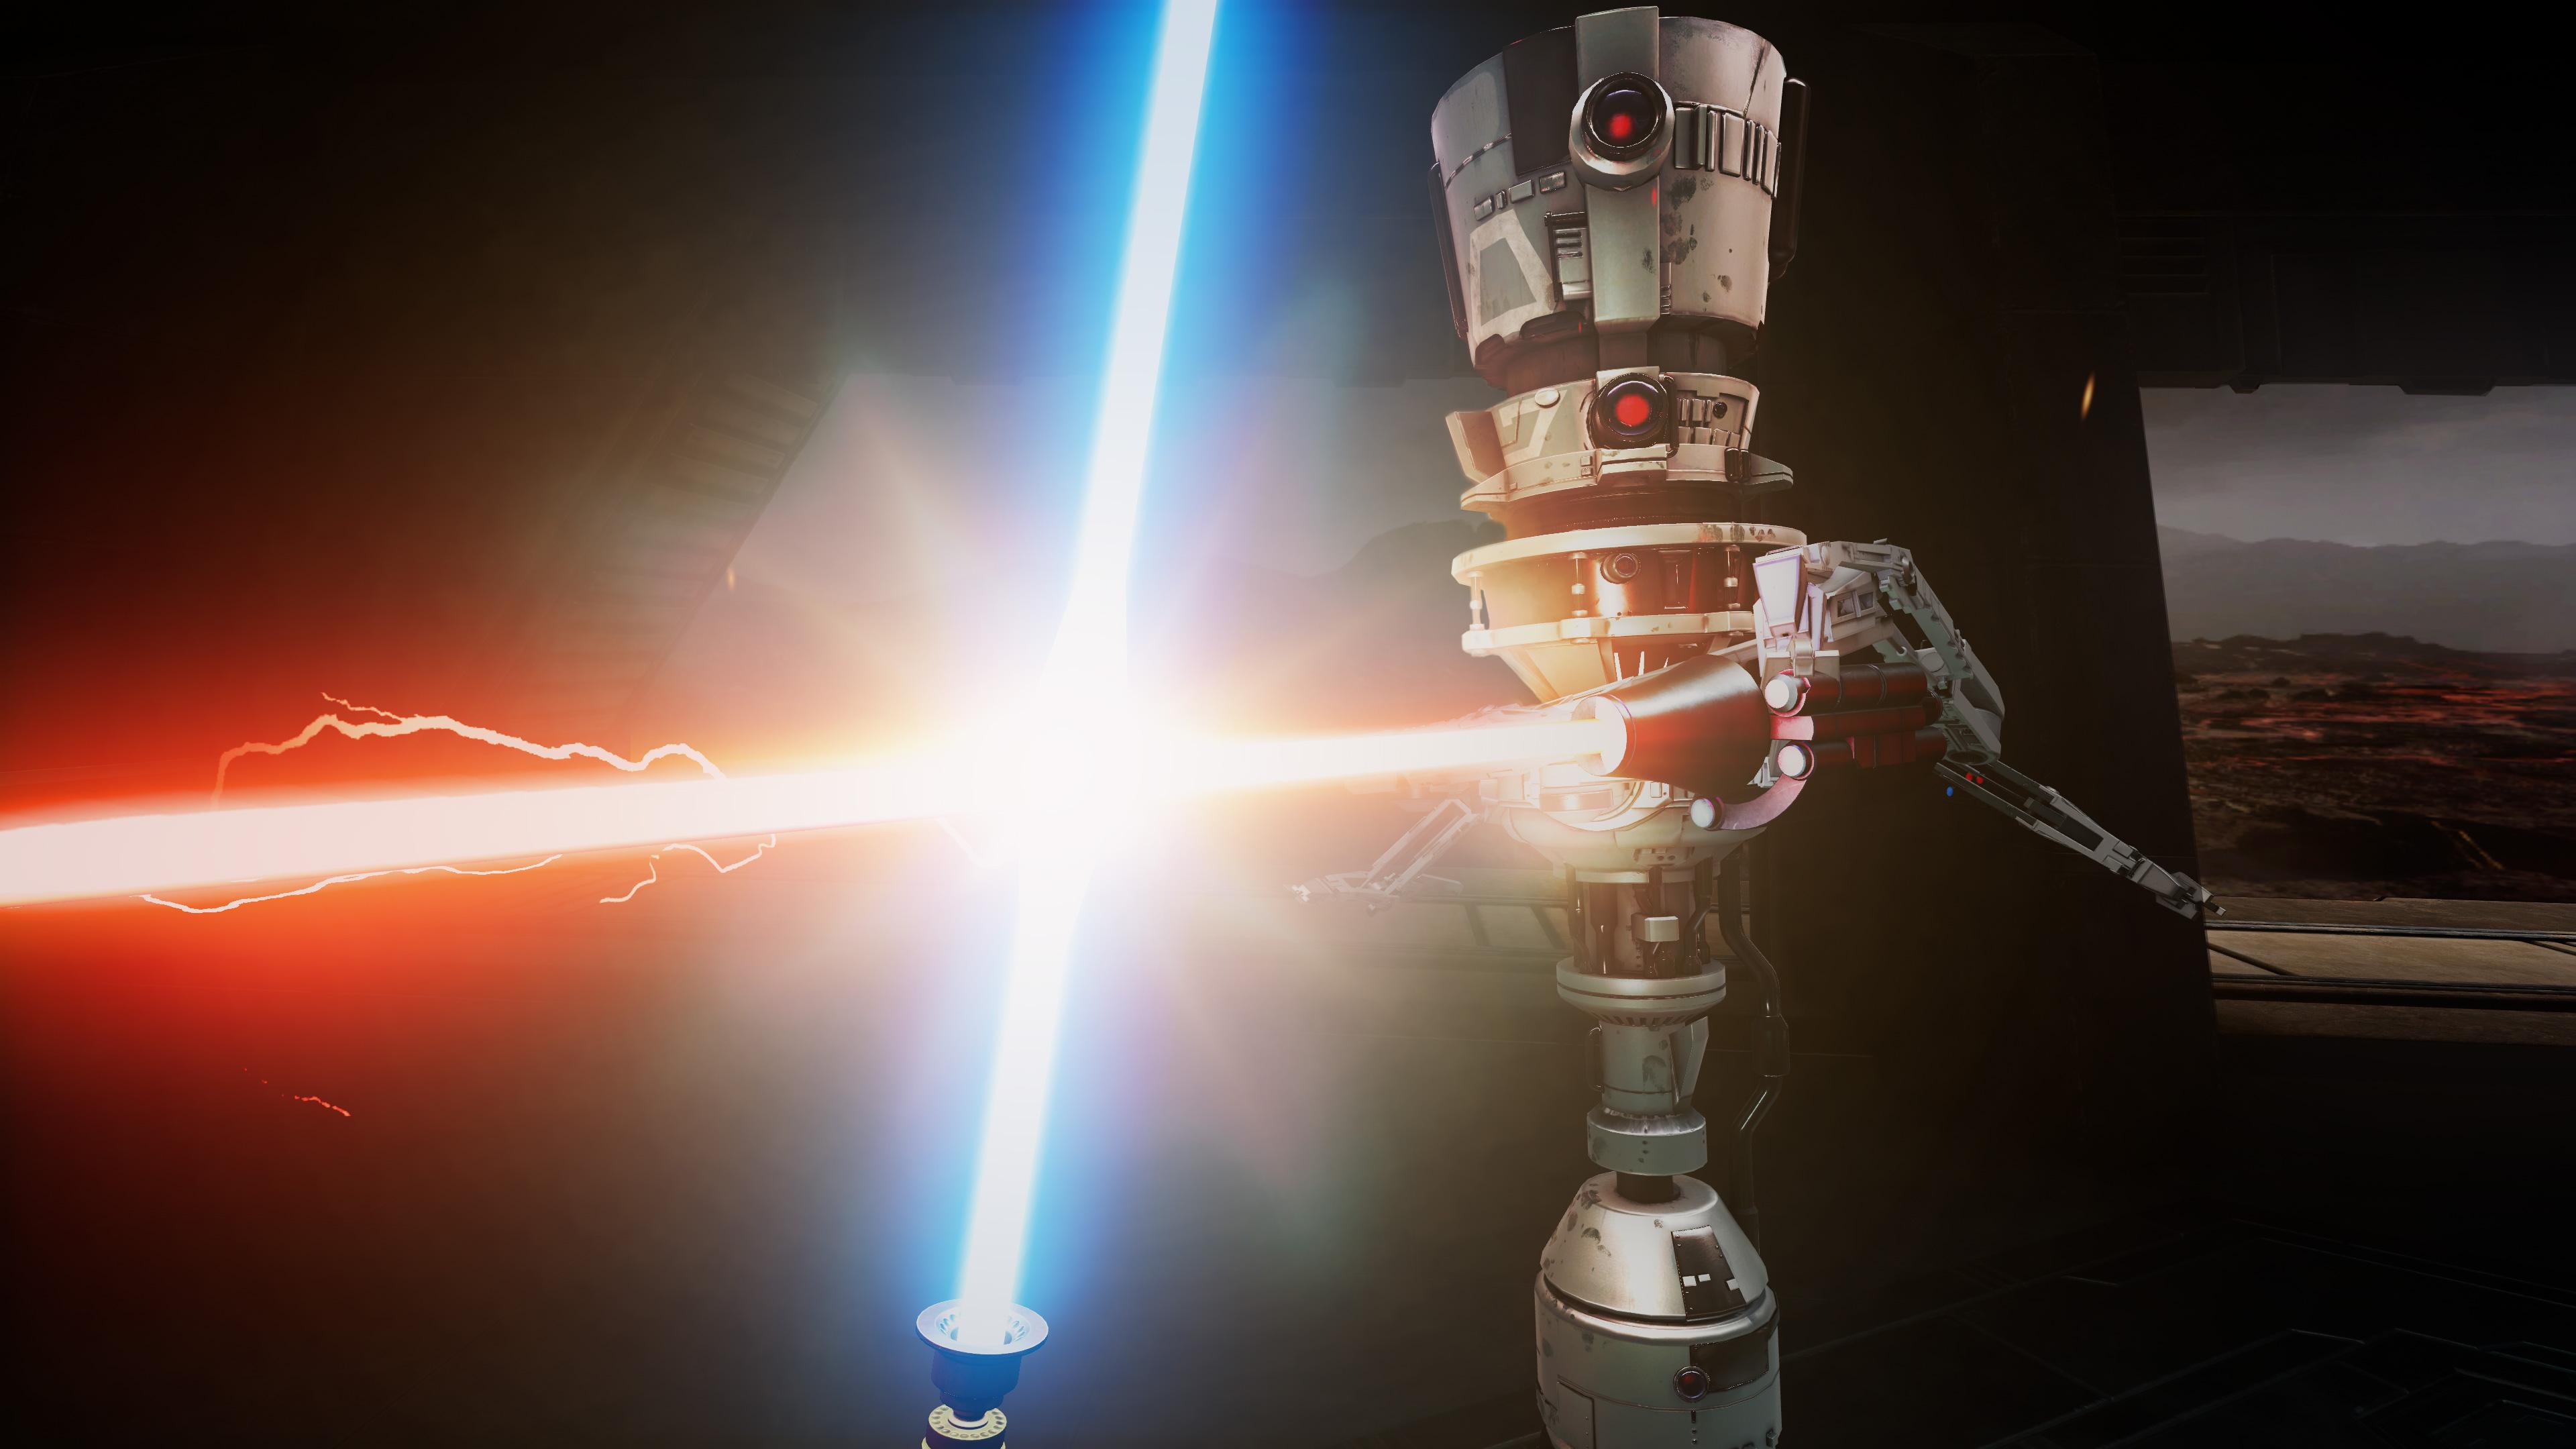 7 Tips and Tricks to Master the Lightsaber Dojo in Vader Immortal on PlayStation VR